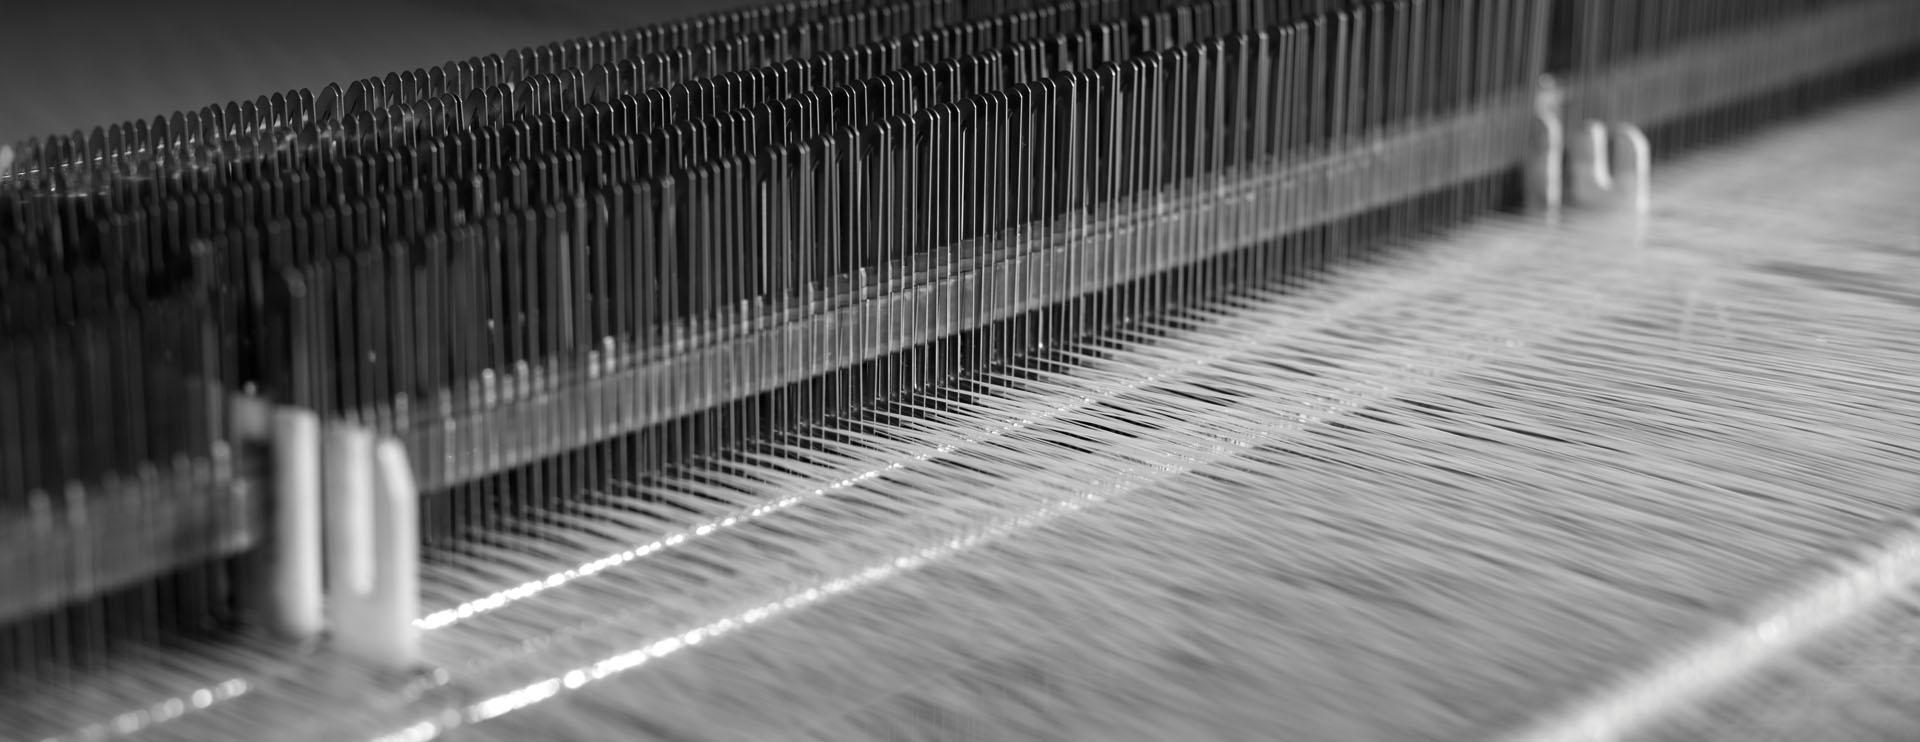 Weave Types